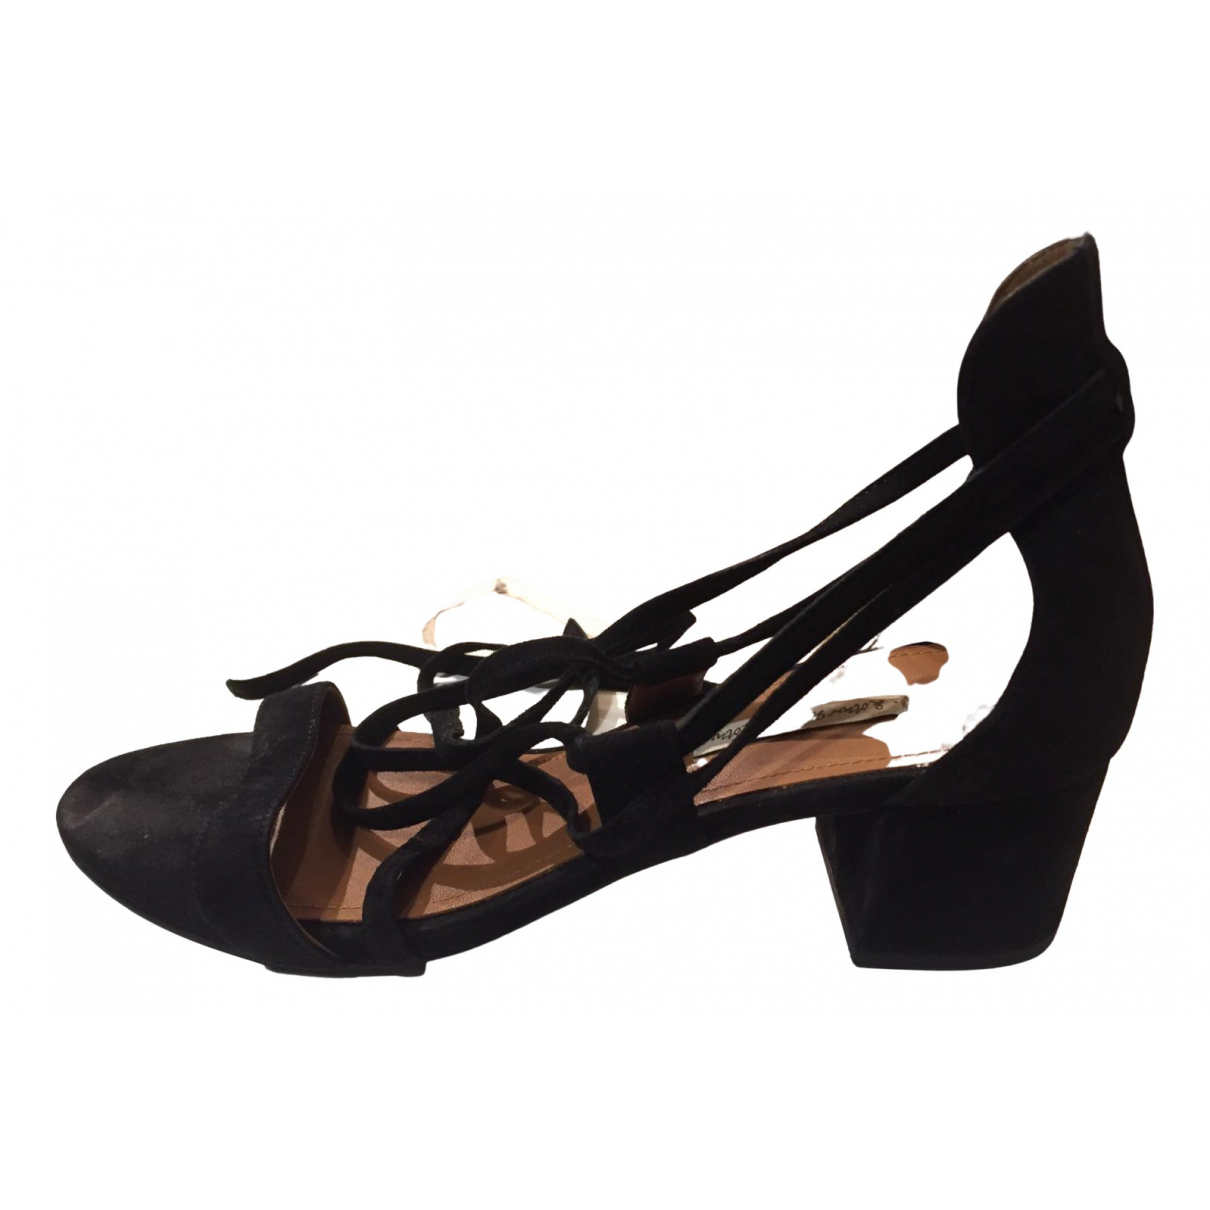 & Stories N Black Suede Sandals for Women 39 EU